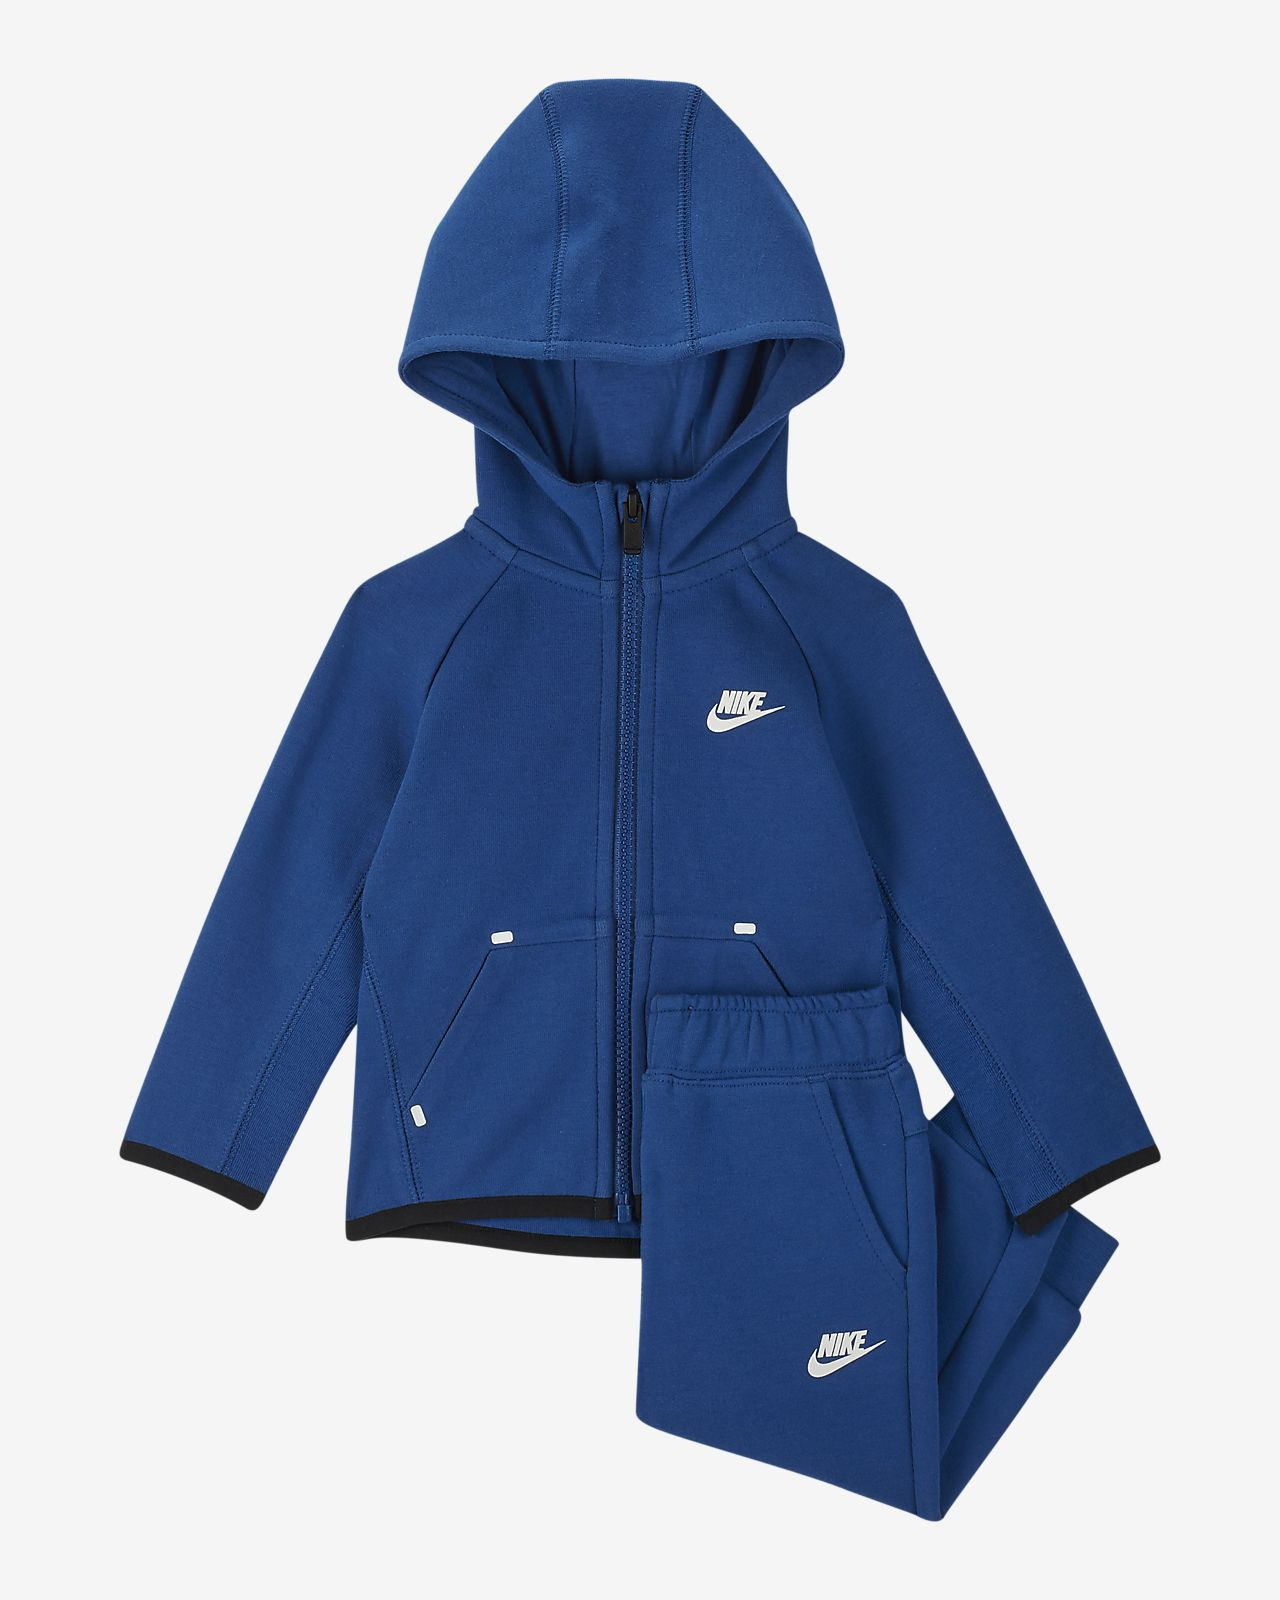 c78e7ce98510 Nike Sportswear Tech Fleece Infant 2-Piece Set. Nike.com